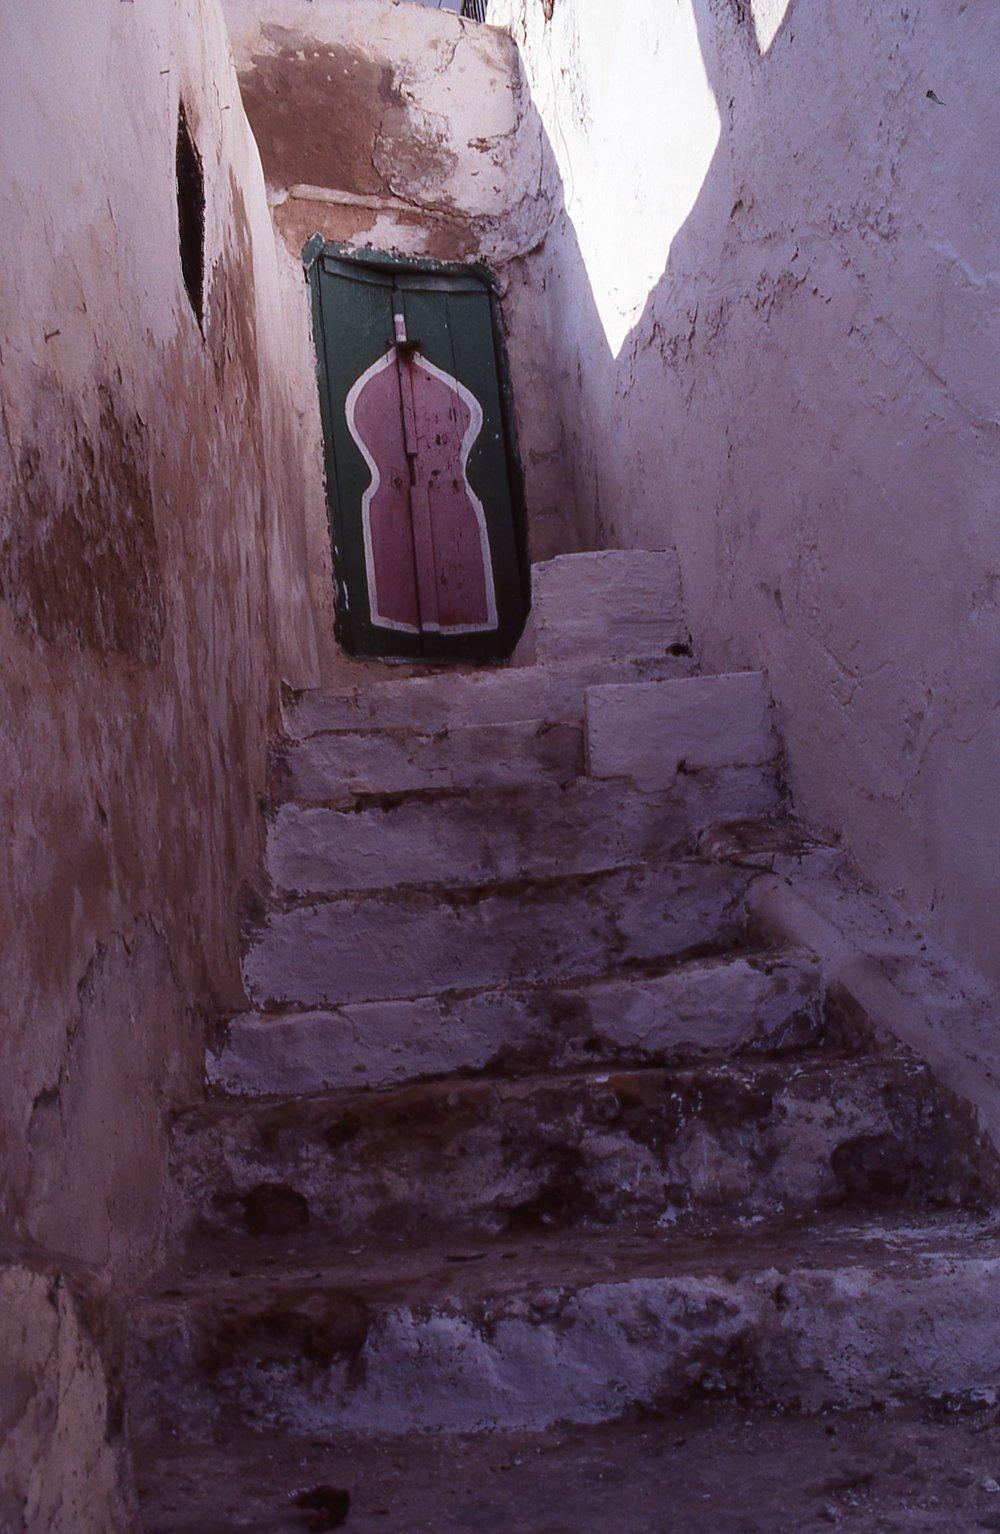 Tunisia | Sidi Bou Said | Tunisian door and stairs | photo sandrine cohen